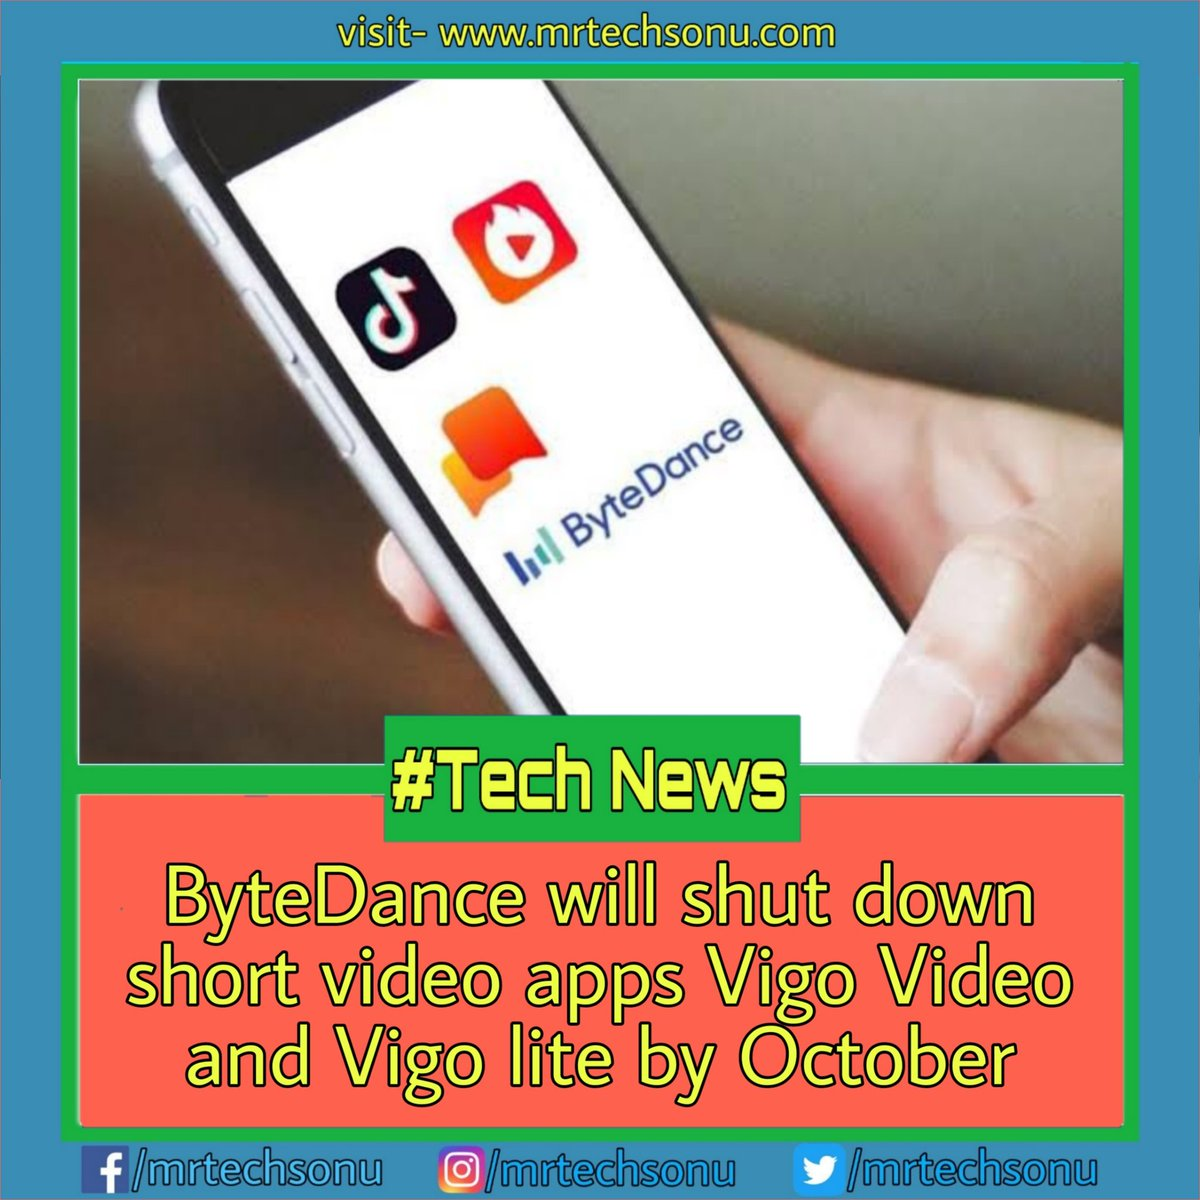 Visit http://mrtechsonu.com for more stuffs like this . ByteDance owns Tik Tok, Vigo and Helo apps. . Hashtag:-#technologyrocks#technologyr#technologylover#technologytrends#instatechnology#remotecontrol#tiktok#technews#techvideos#informationtechnology#technologyartpic.twitter.com/WpFQuFKlex